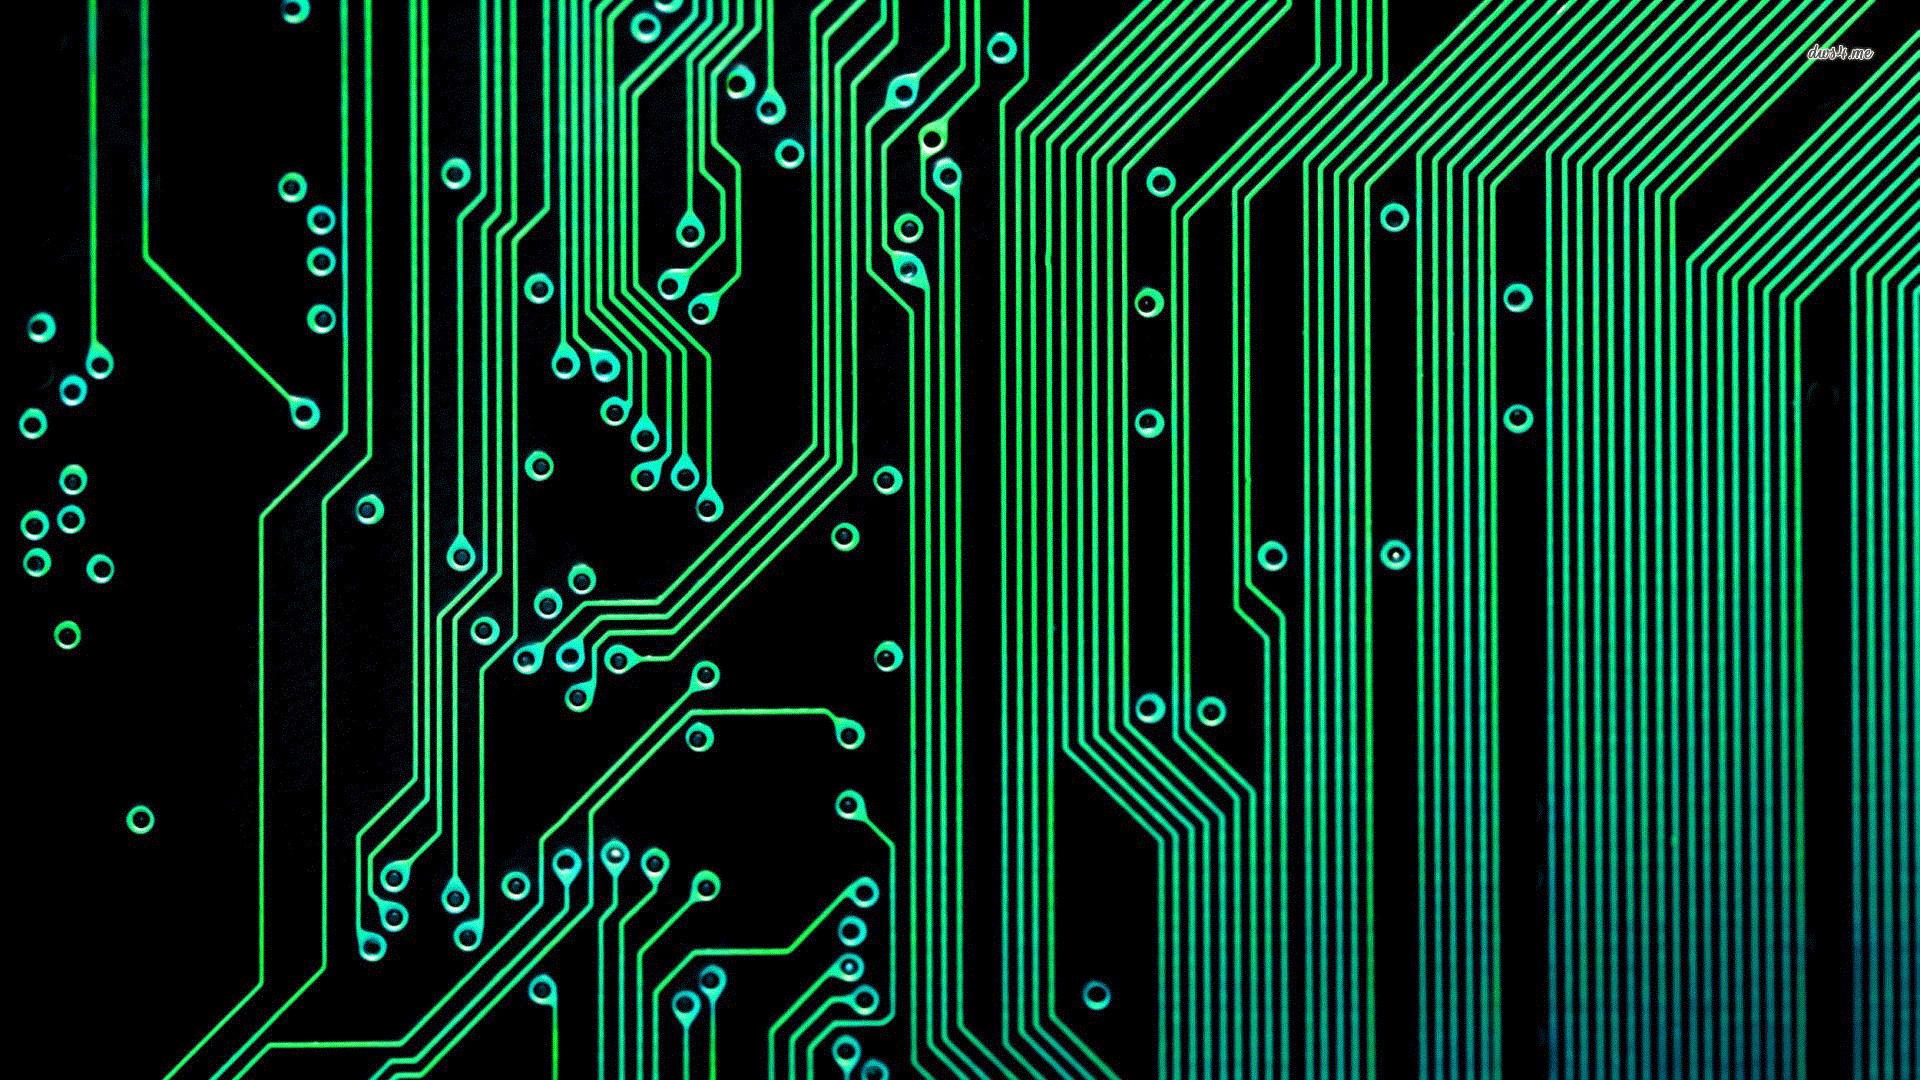 Download Futuristic <b>Tech Wallpaper</b> High Quality Resolution #11mm